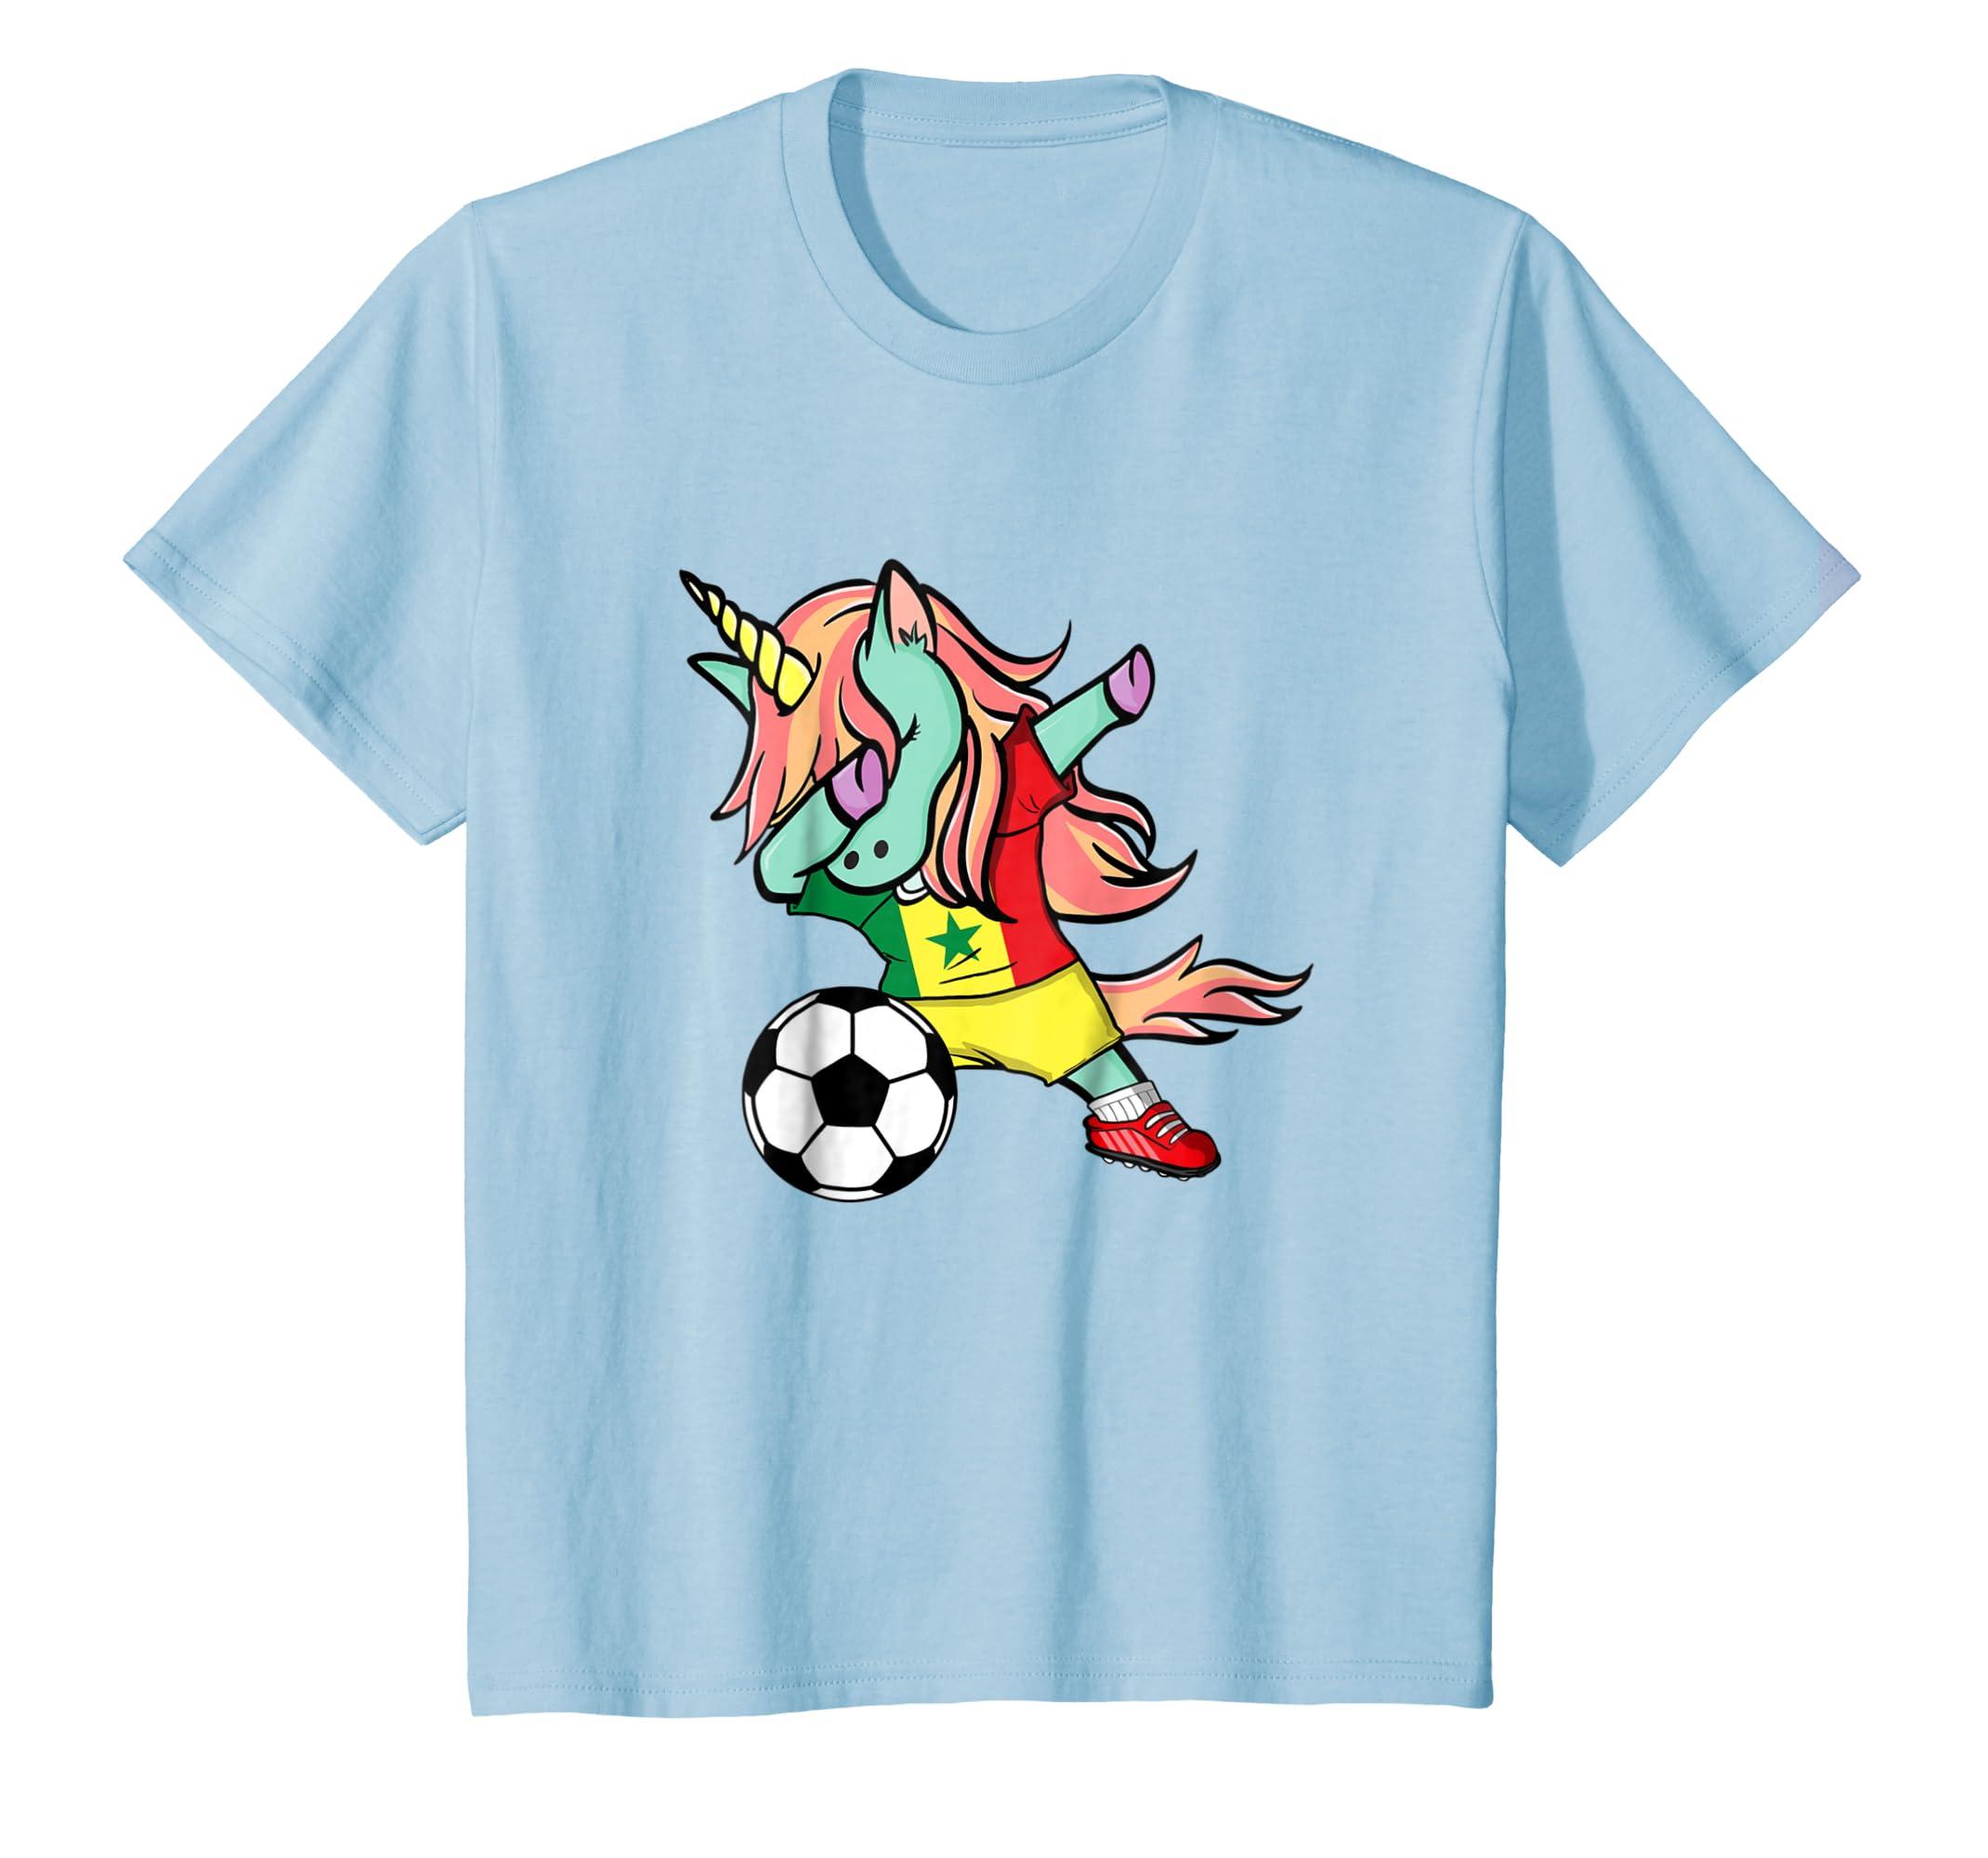 7f2308067 Amazon.com  Dabbing Unicorn Soccer Senegal Jersey Shirt 2018 Football   Clothing